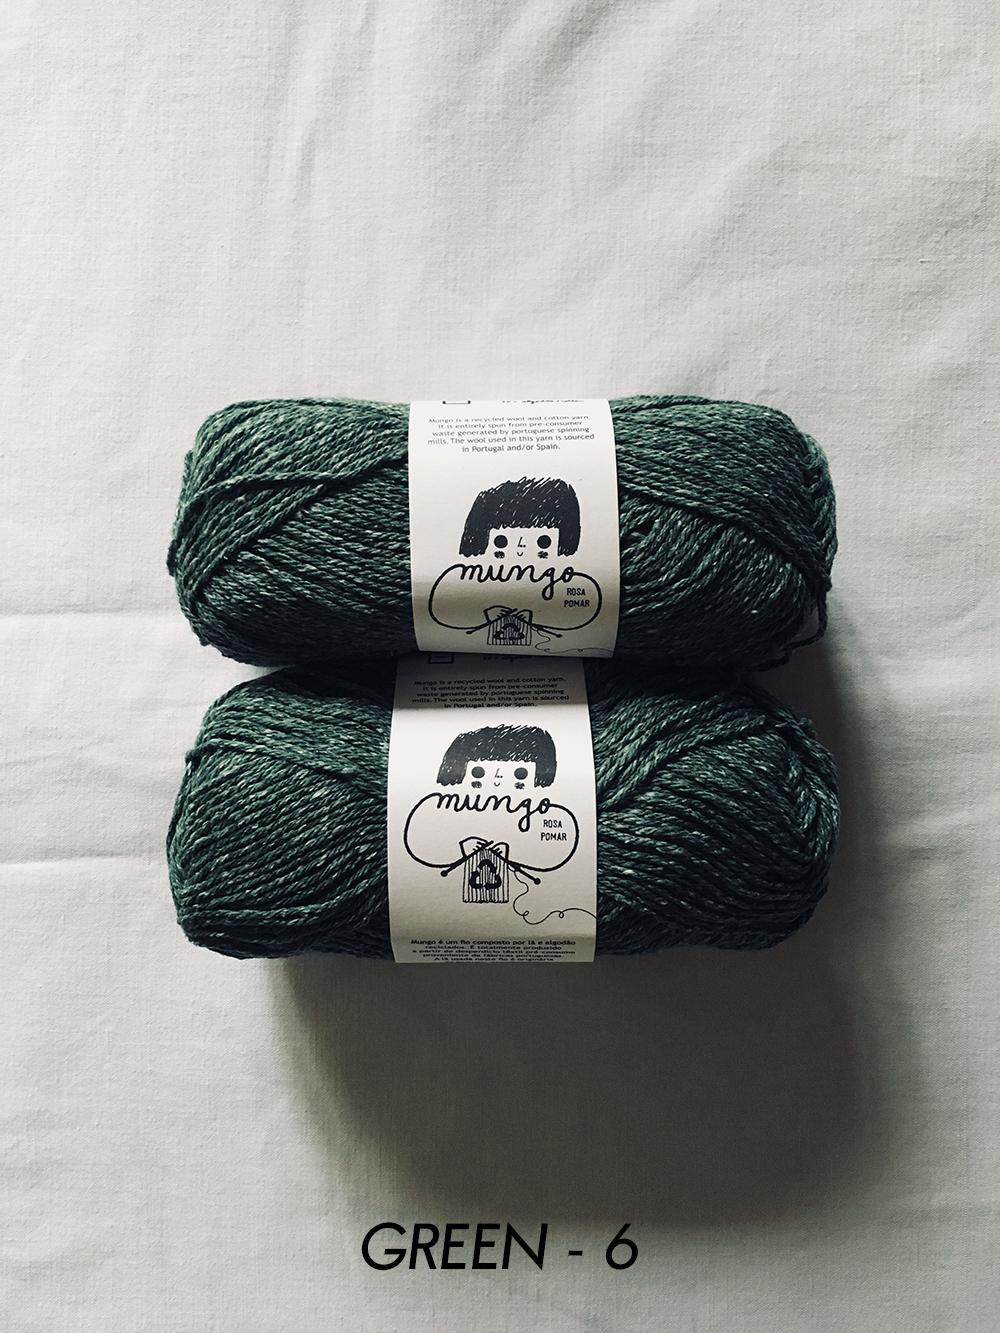 retrosaria_mungo_6_wool_done_knitting2.jpg